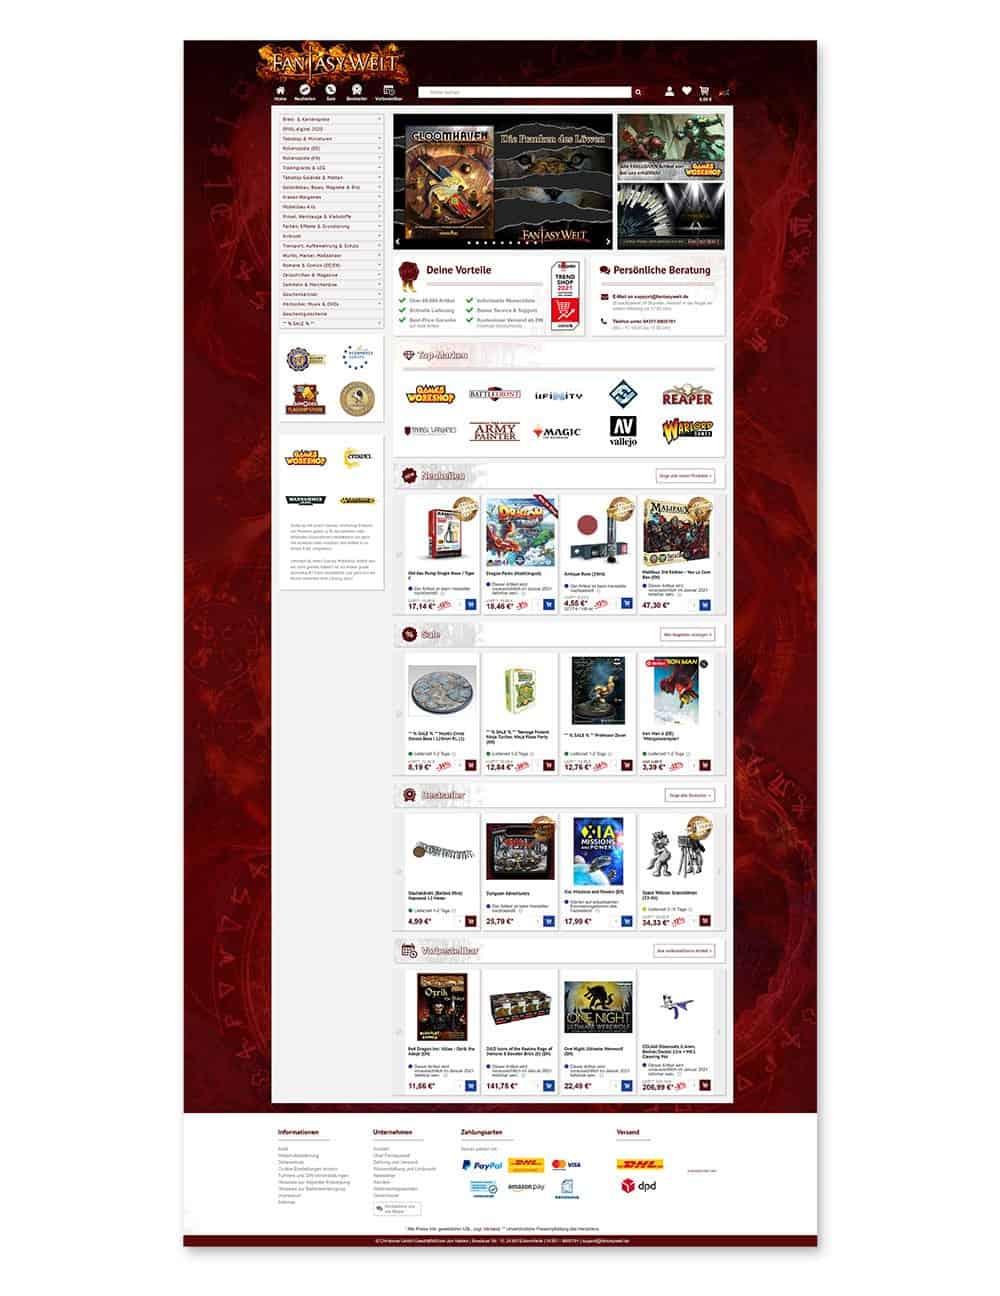 Fantasywelt Onlineshop Webdesign, Logodesign, Andrea Baitz Webdesigner, Dessau-Roßlau, Sachsen-Anhalt, Leipzig, Berlin, Magdeburg